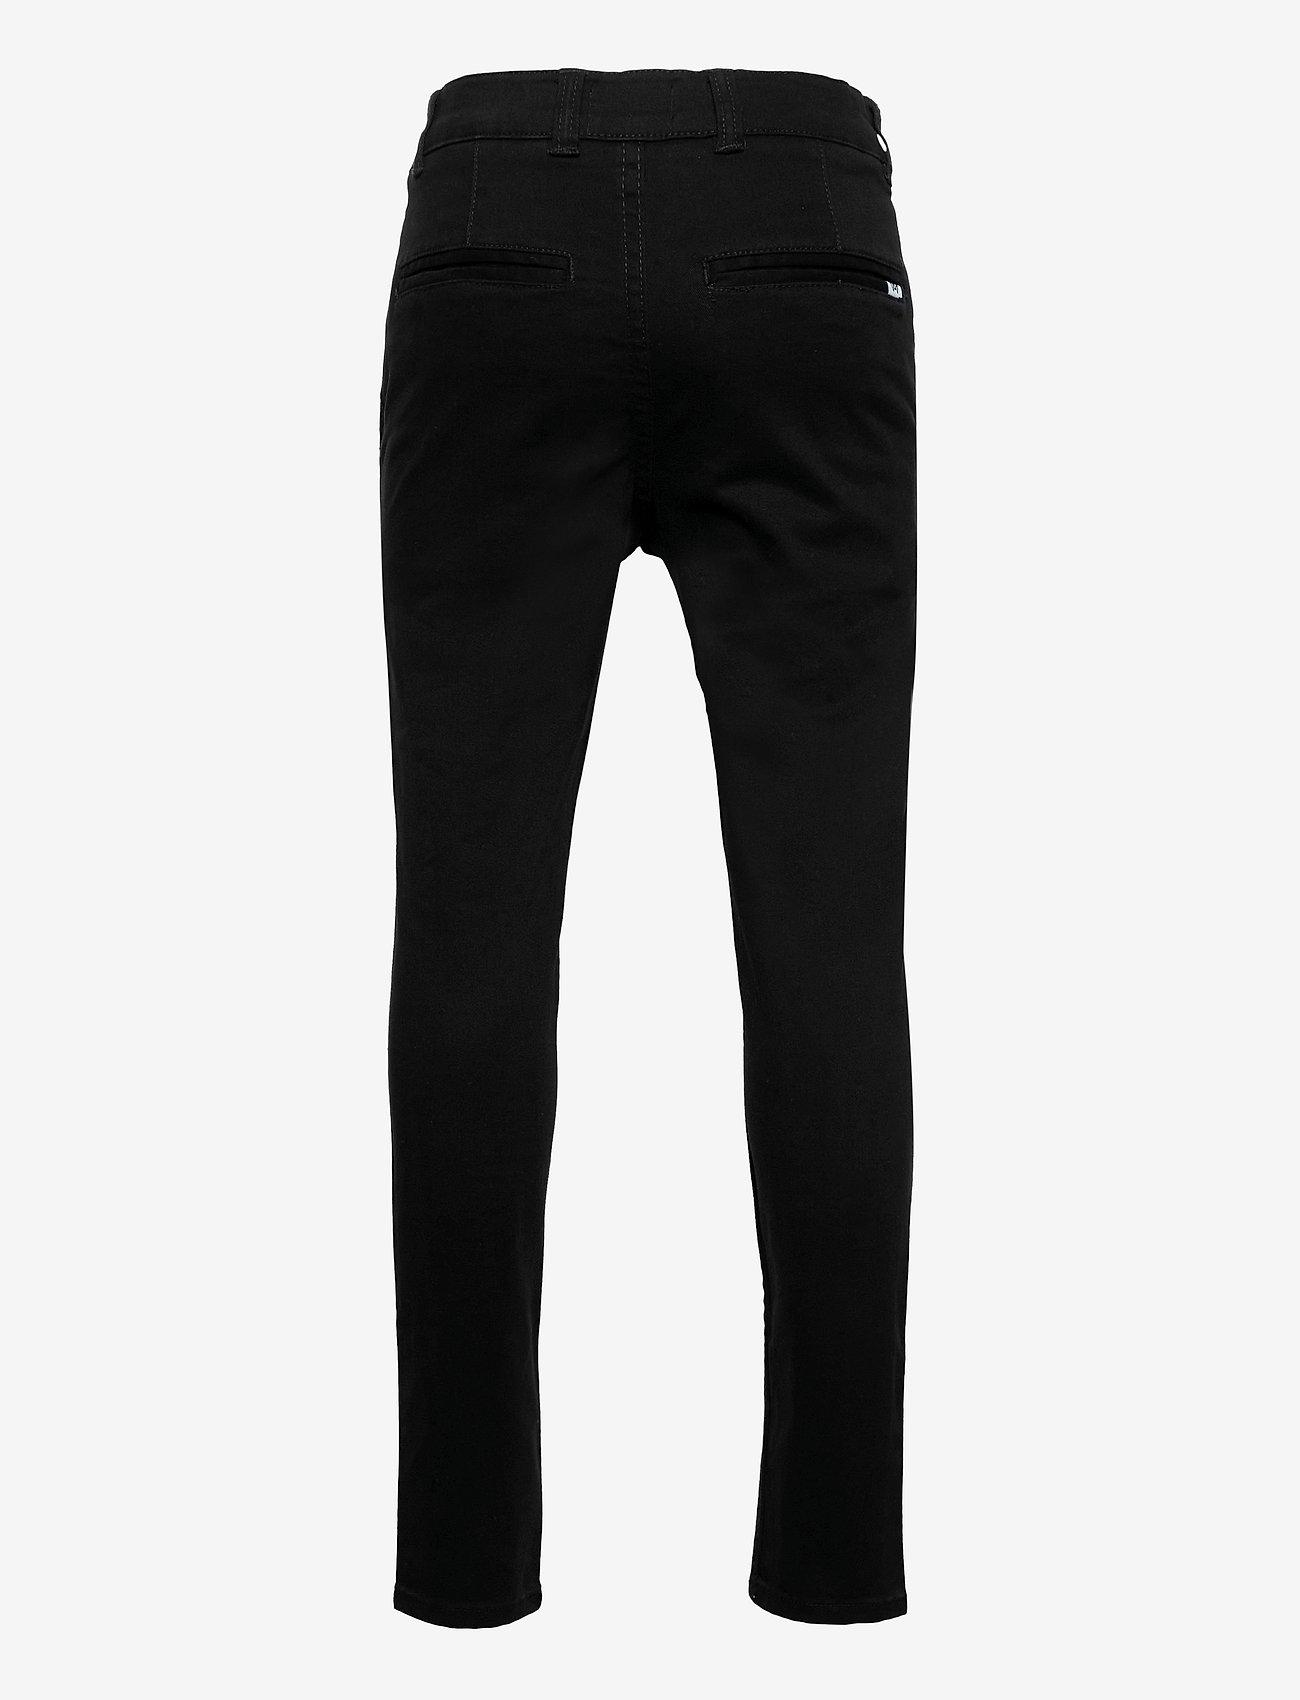 Kronstadt - Daniel Chino - trousers - black - 1